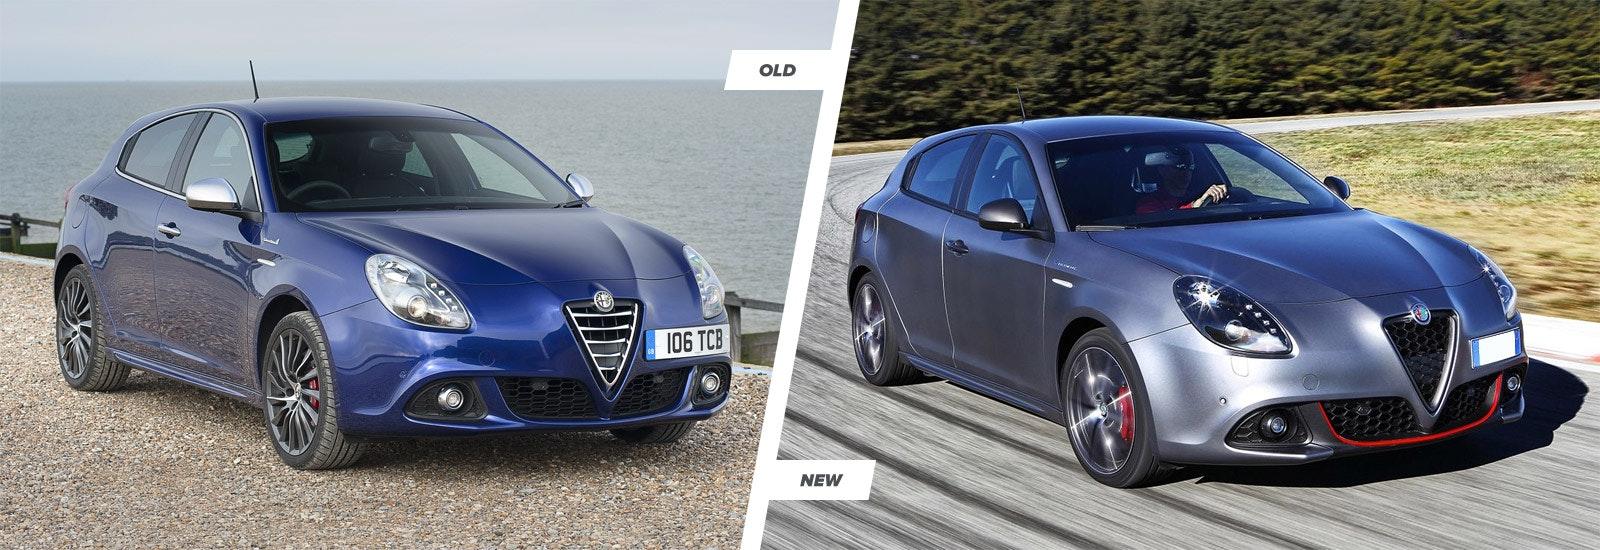 Alfa Romeo Giulietta Facelift Old Vs New Carwow